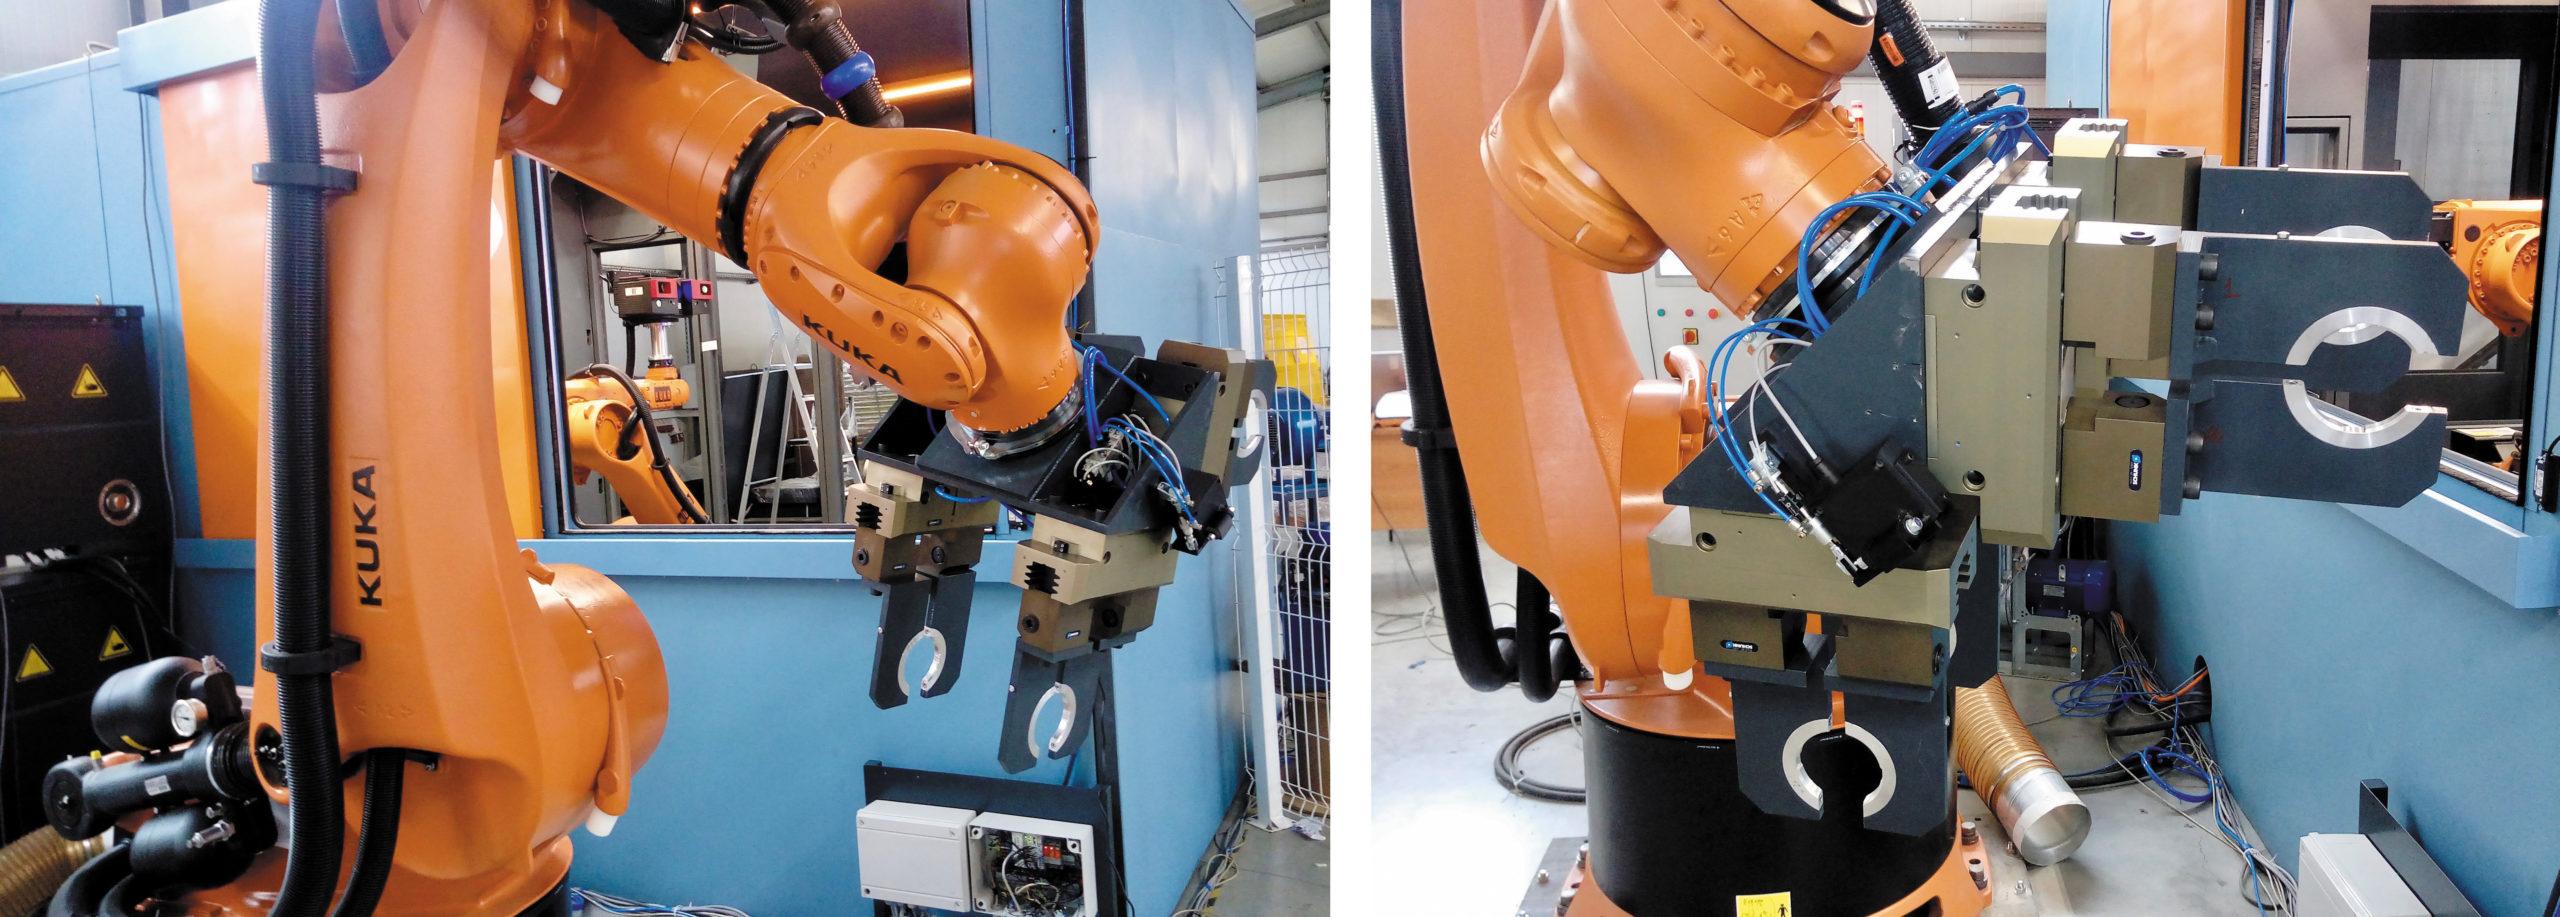 Робот KUKA KR360 с механизмом захвата